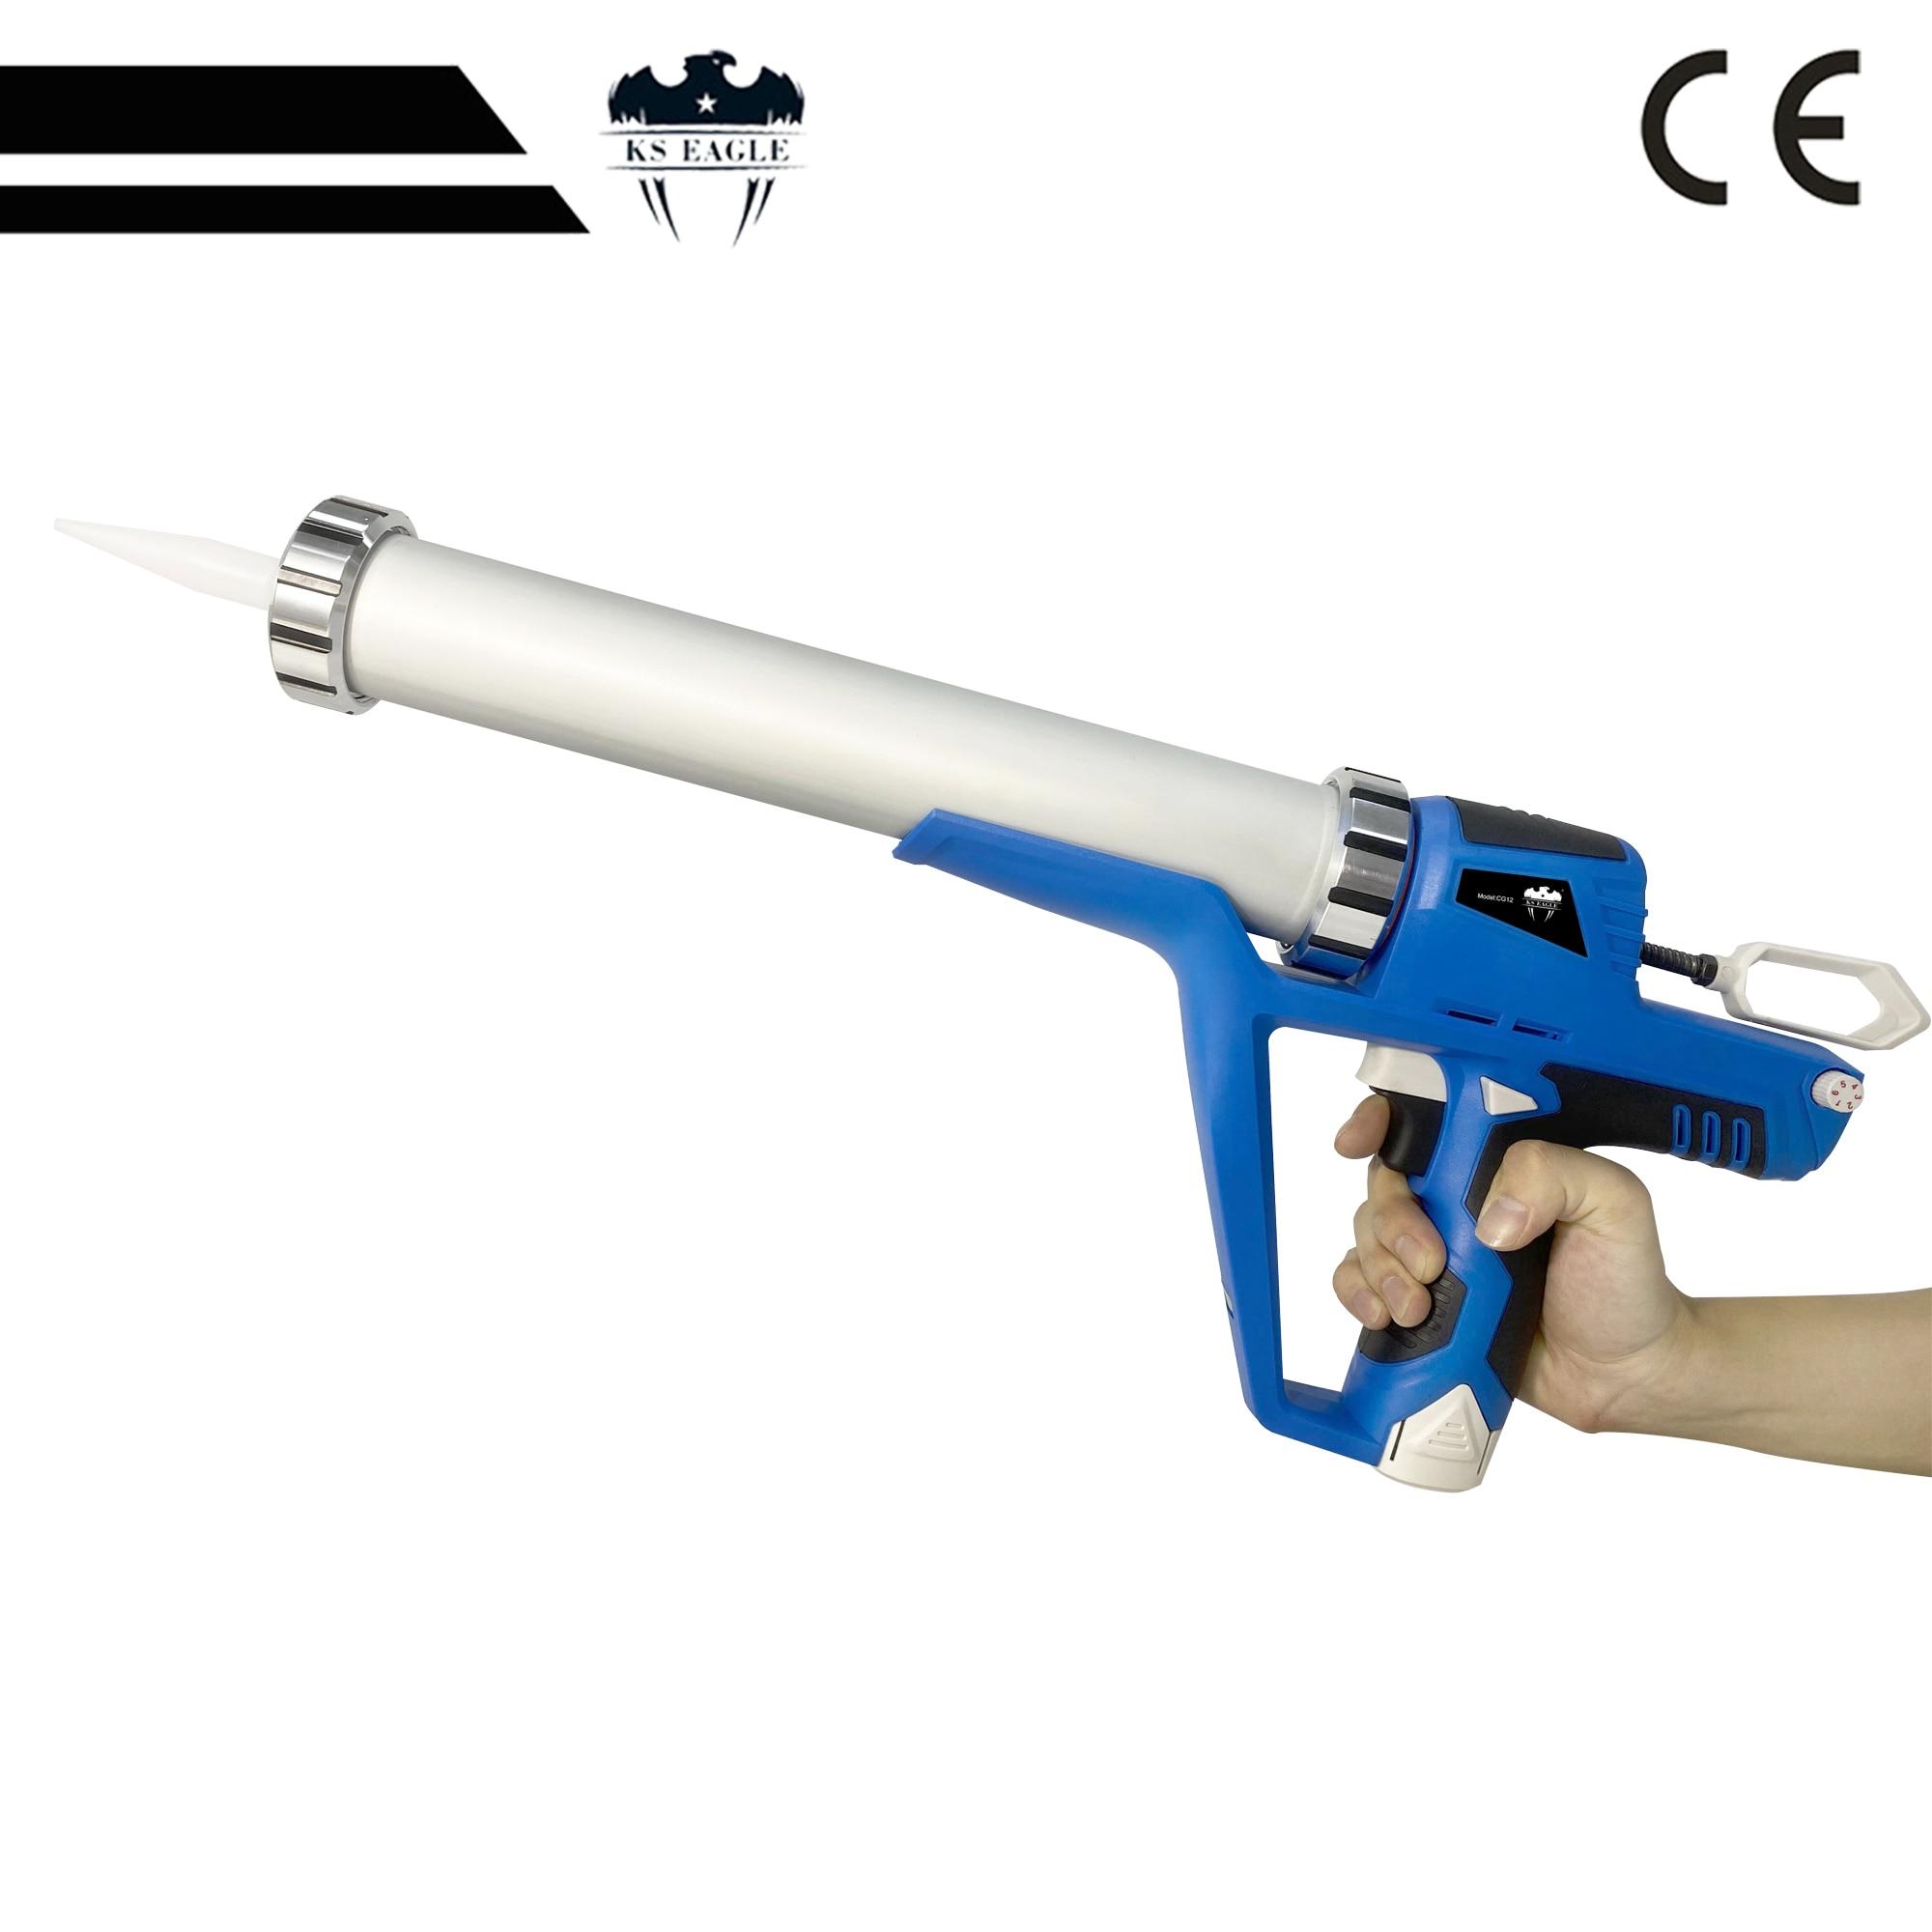 Electric Caulking Gun Cordless Portable Glass Hard Rubber Sealant Gun Handheld Rechargeable With Battery